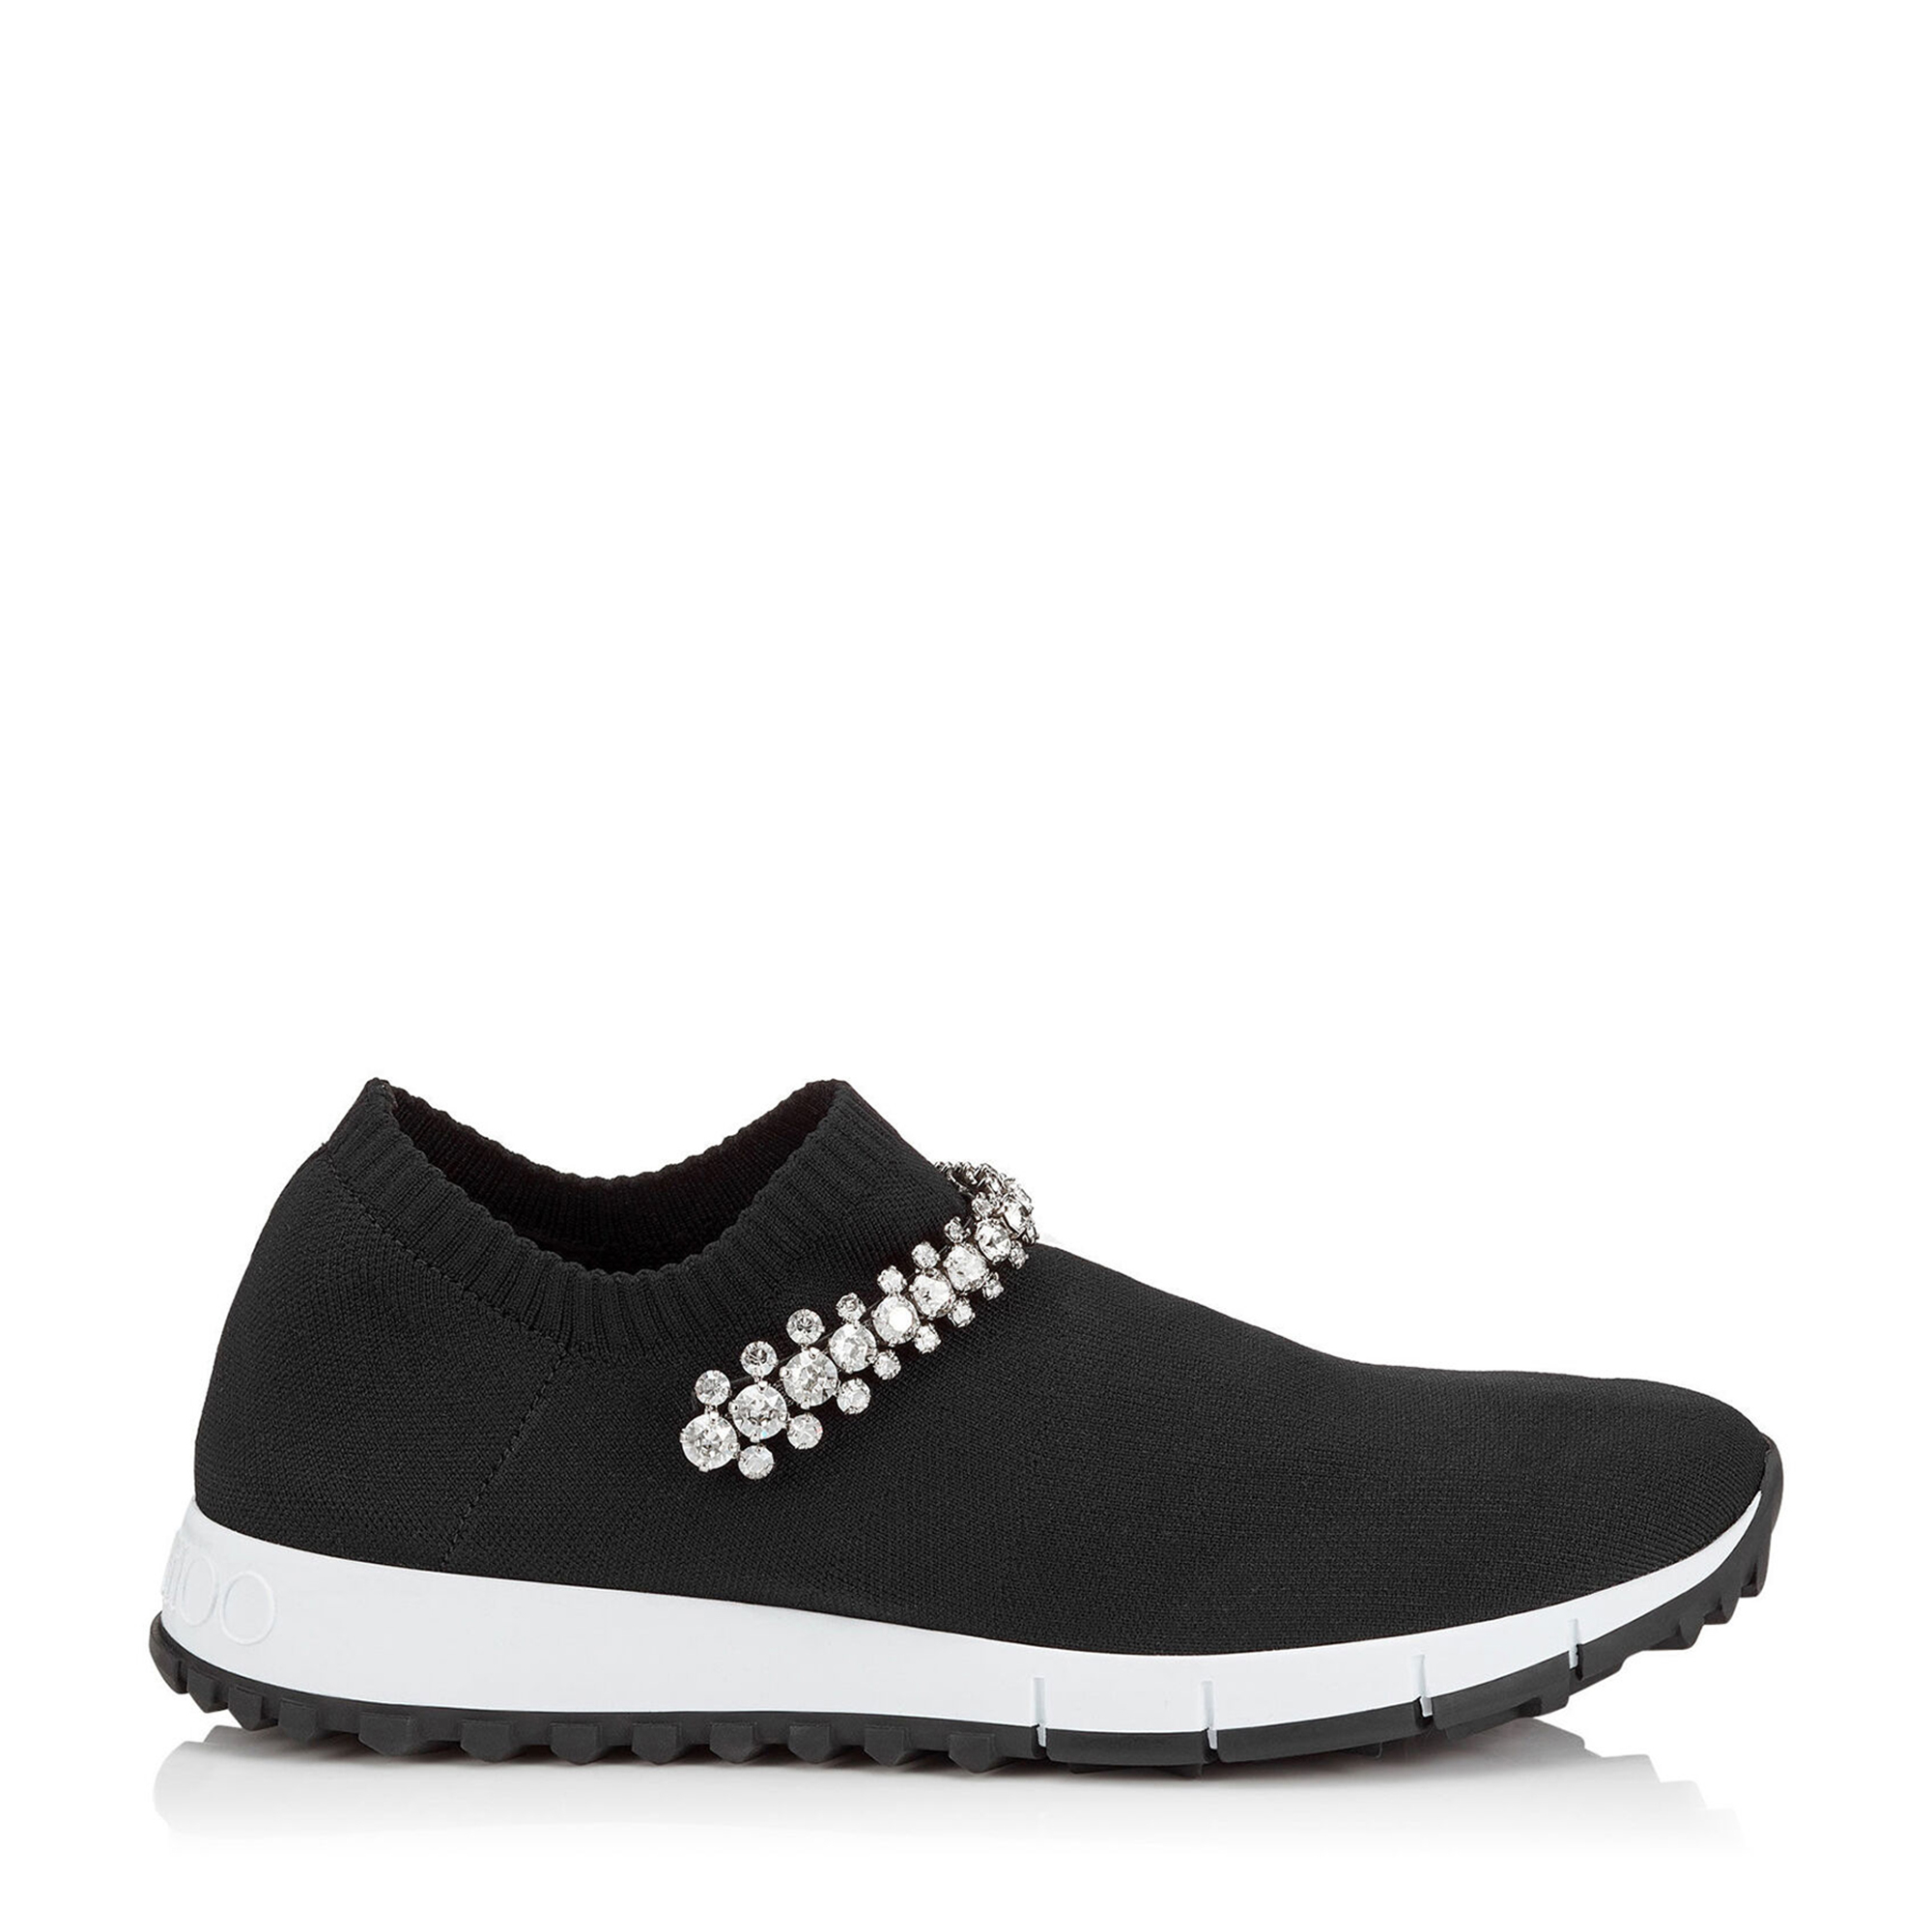 Verona sneakers